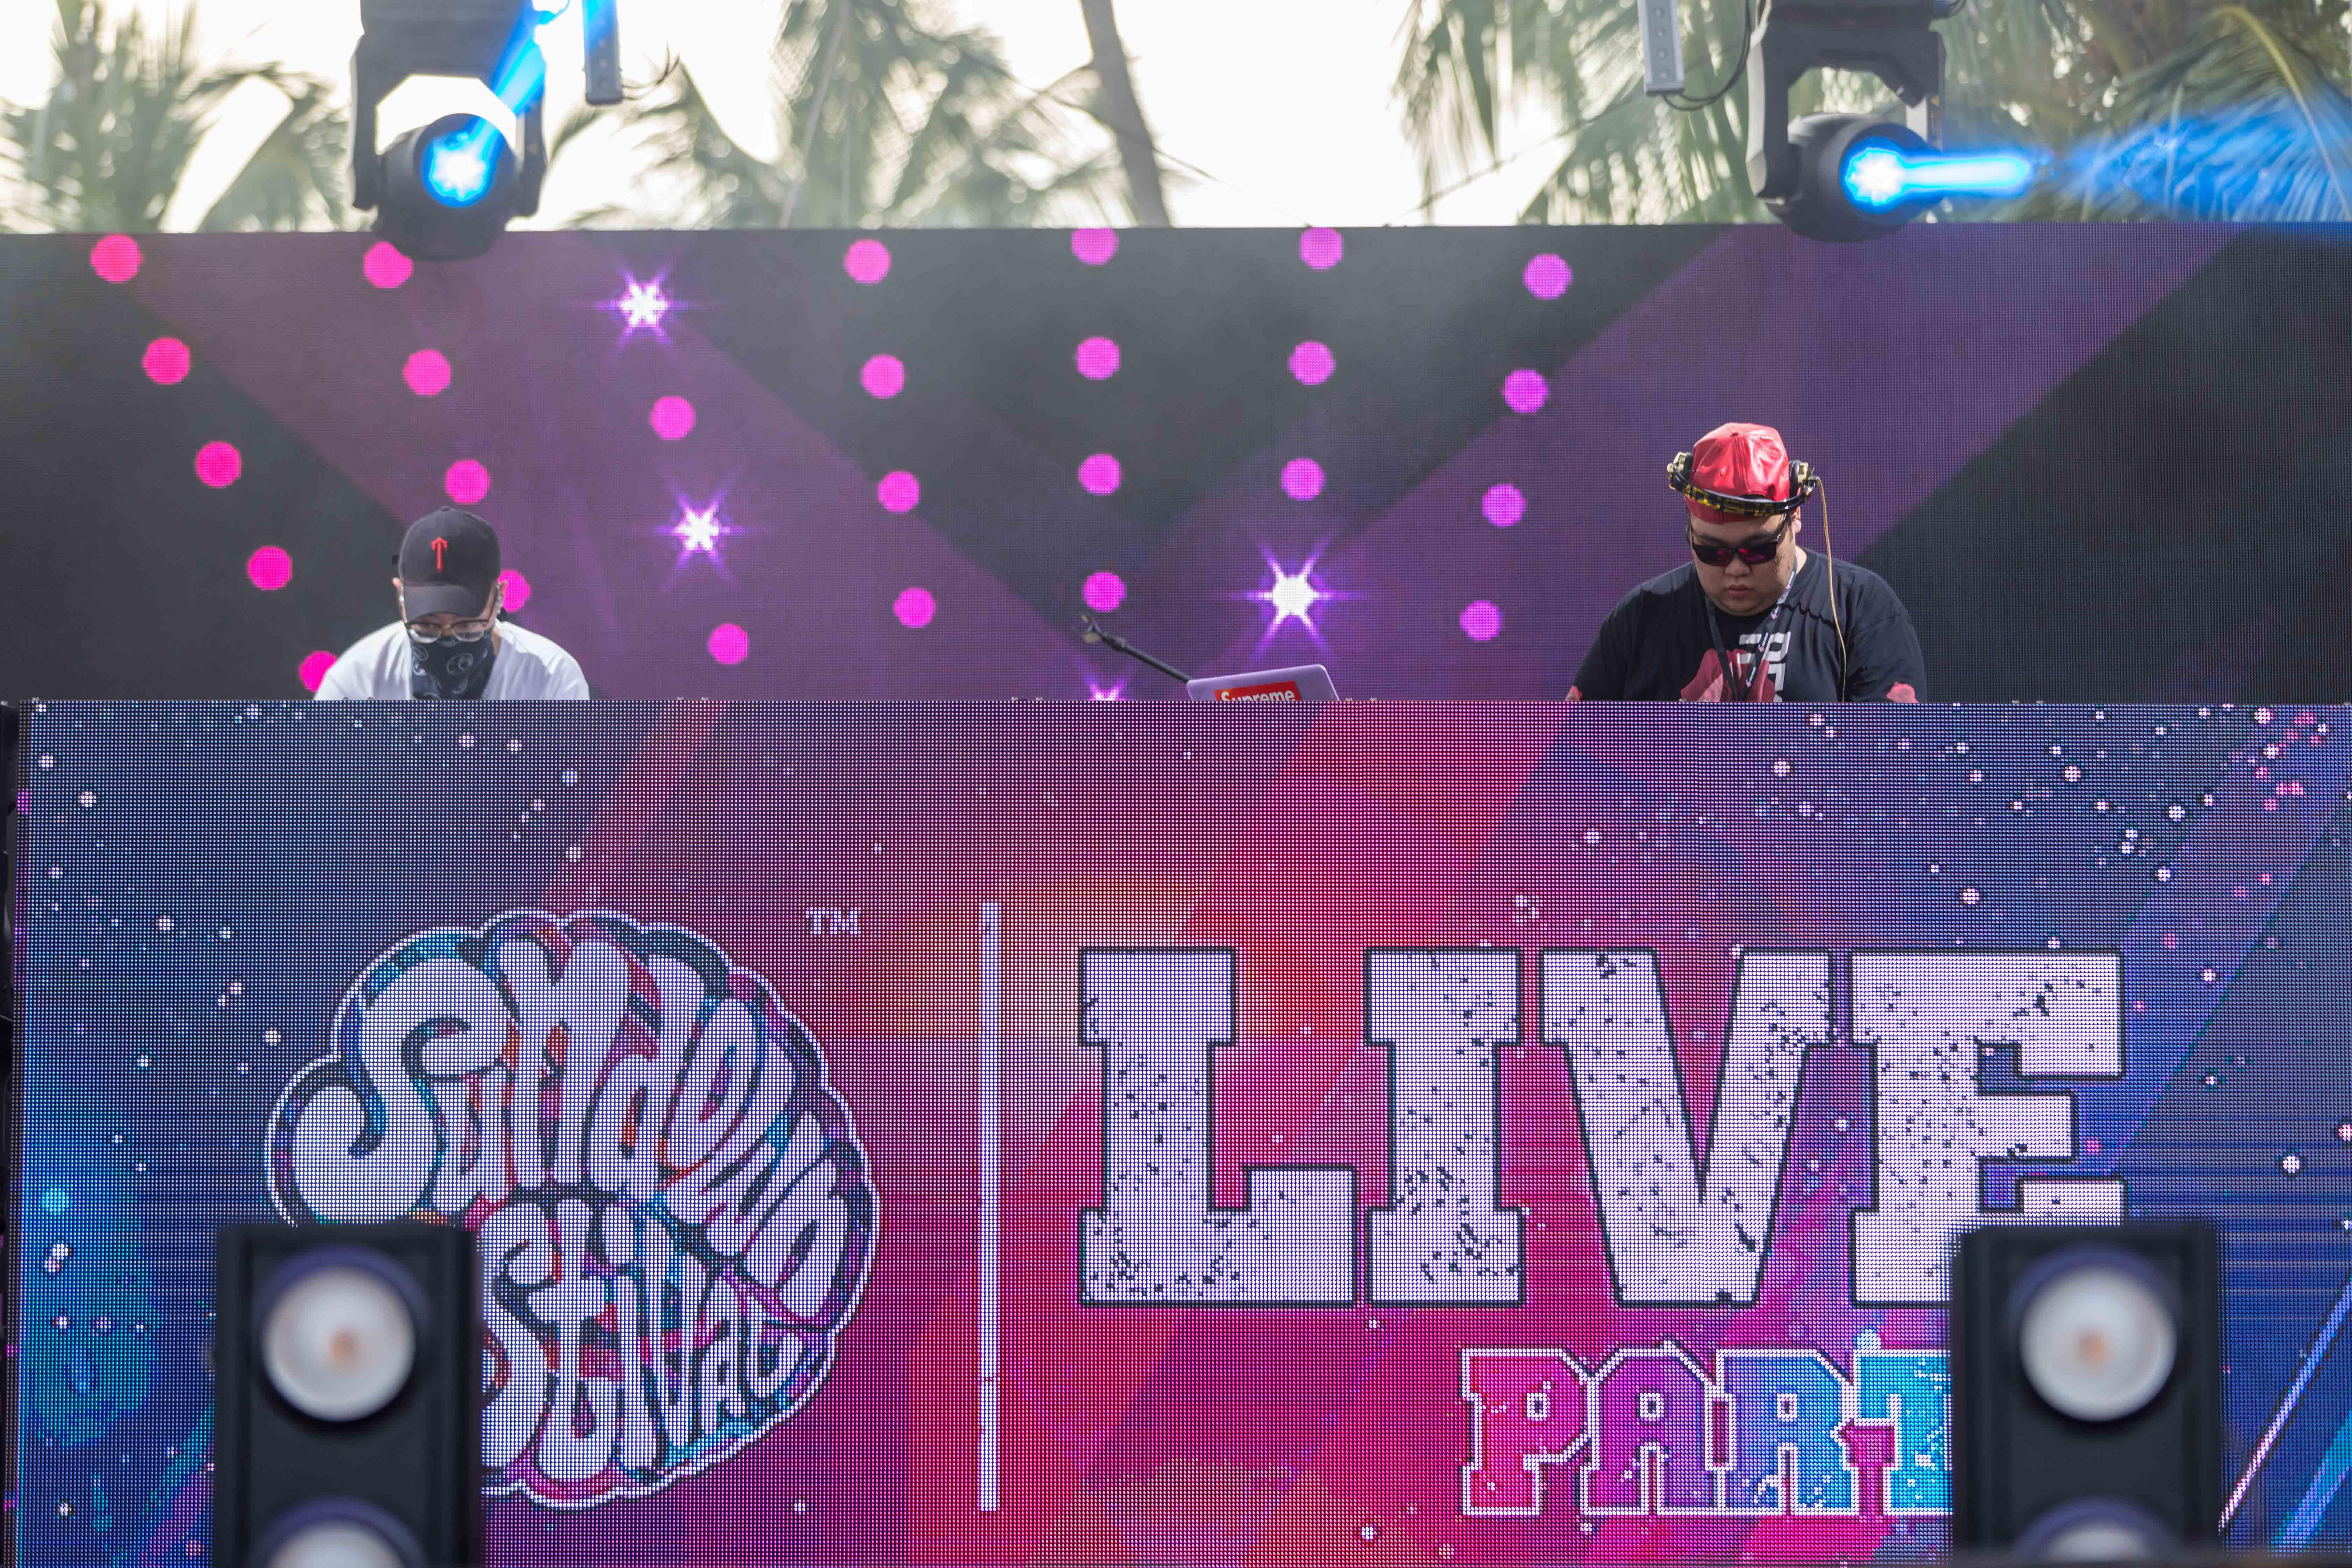 SUNDOWN LIVE PARTY AT FIVB WBV 2018